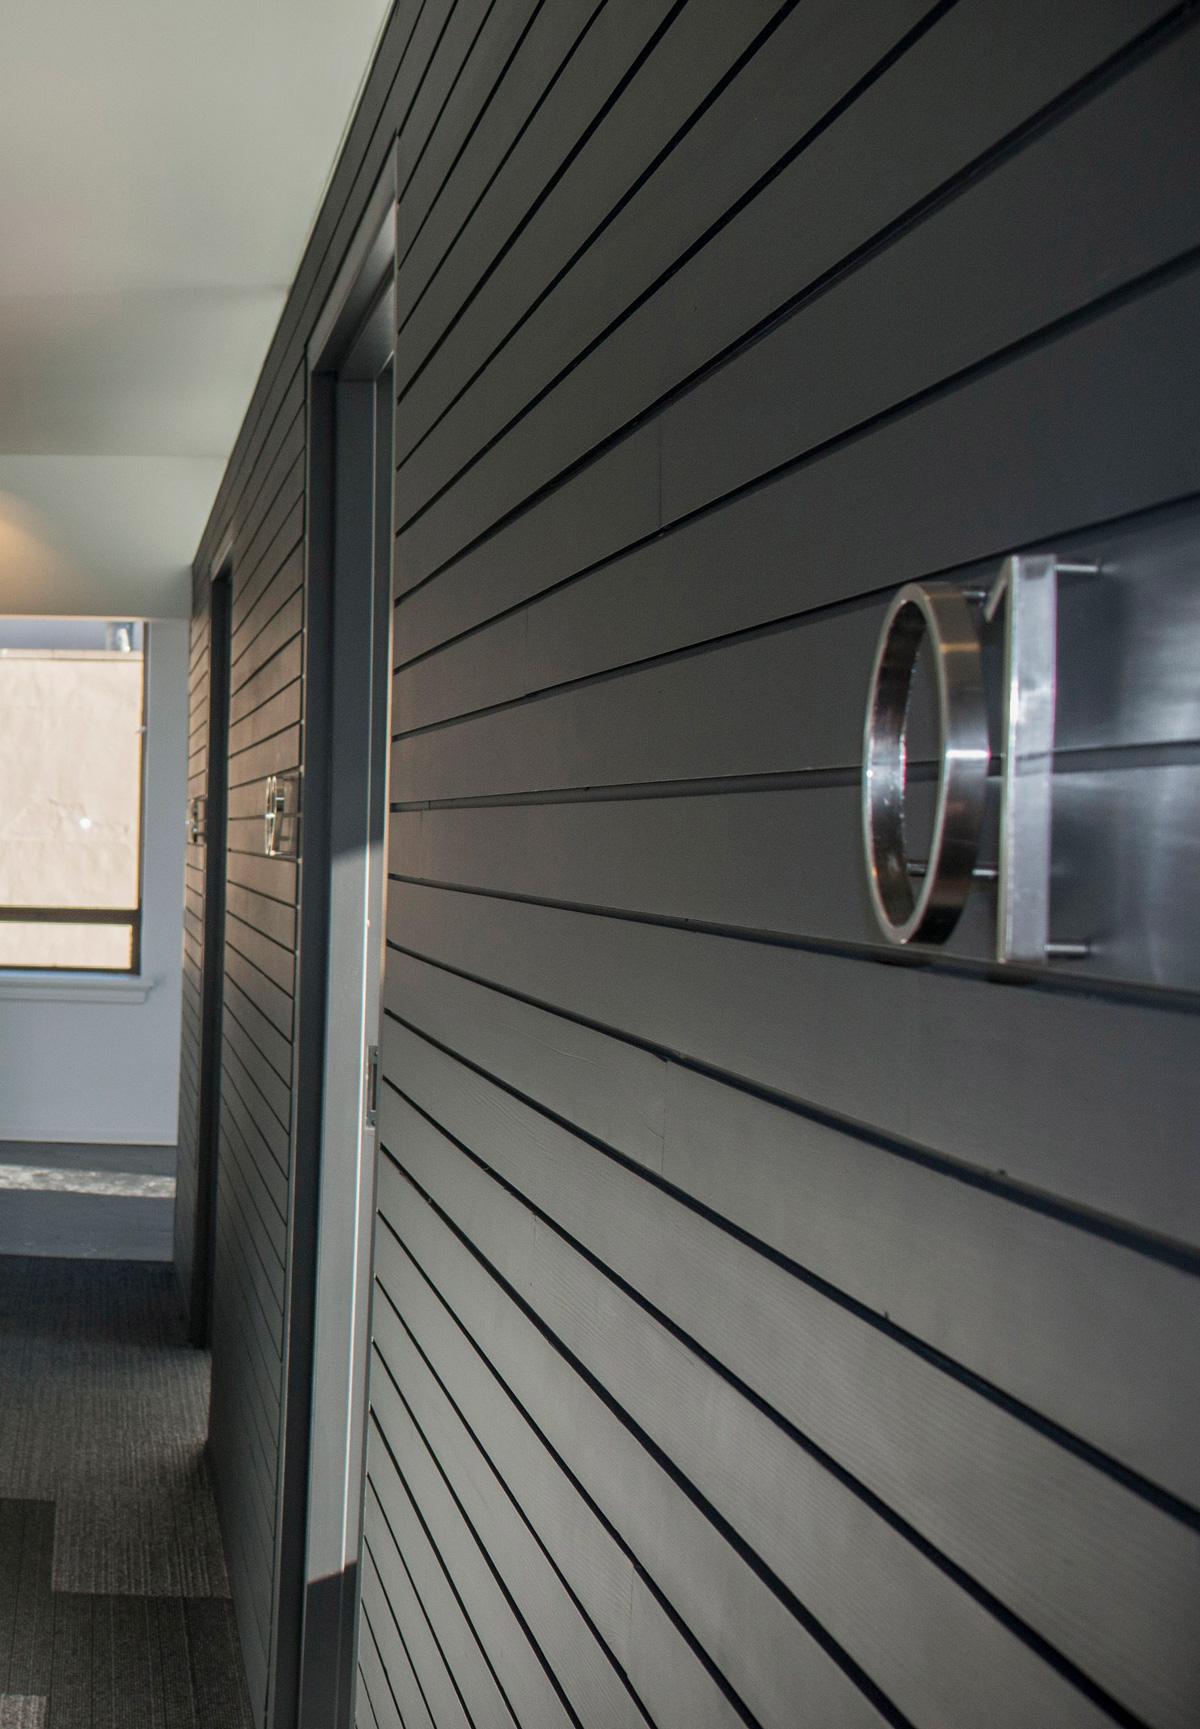 WATG Seattle building interior